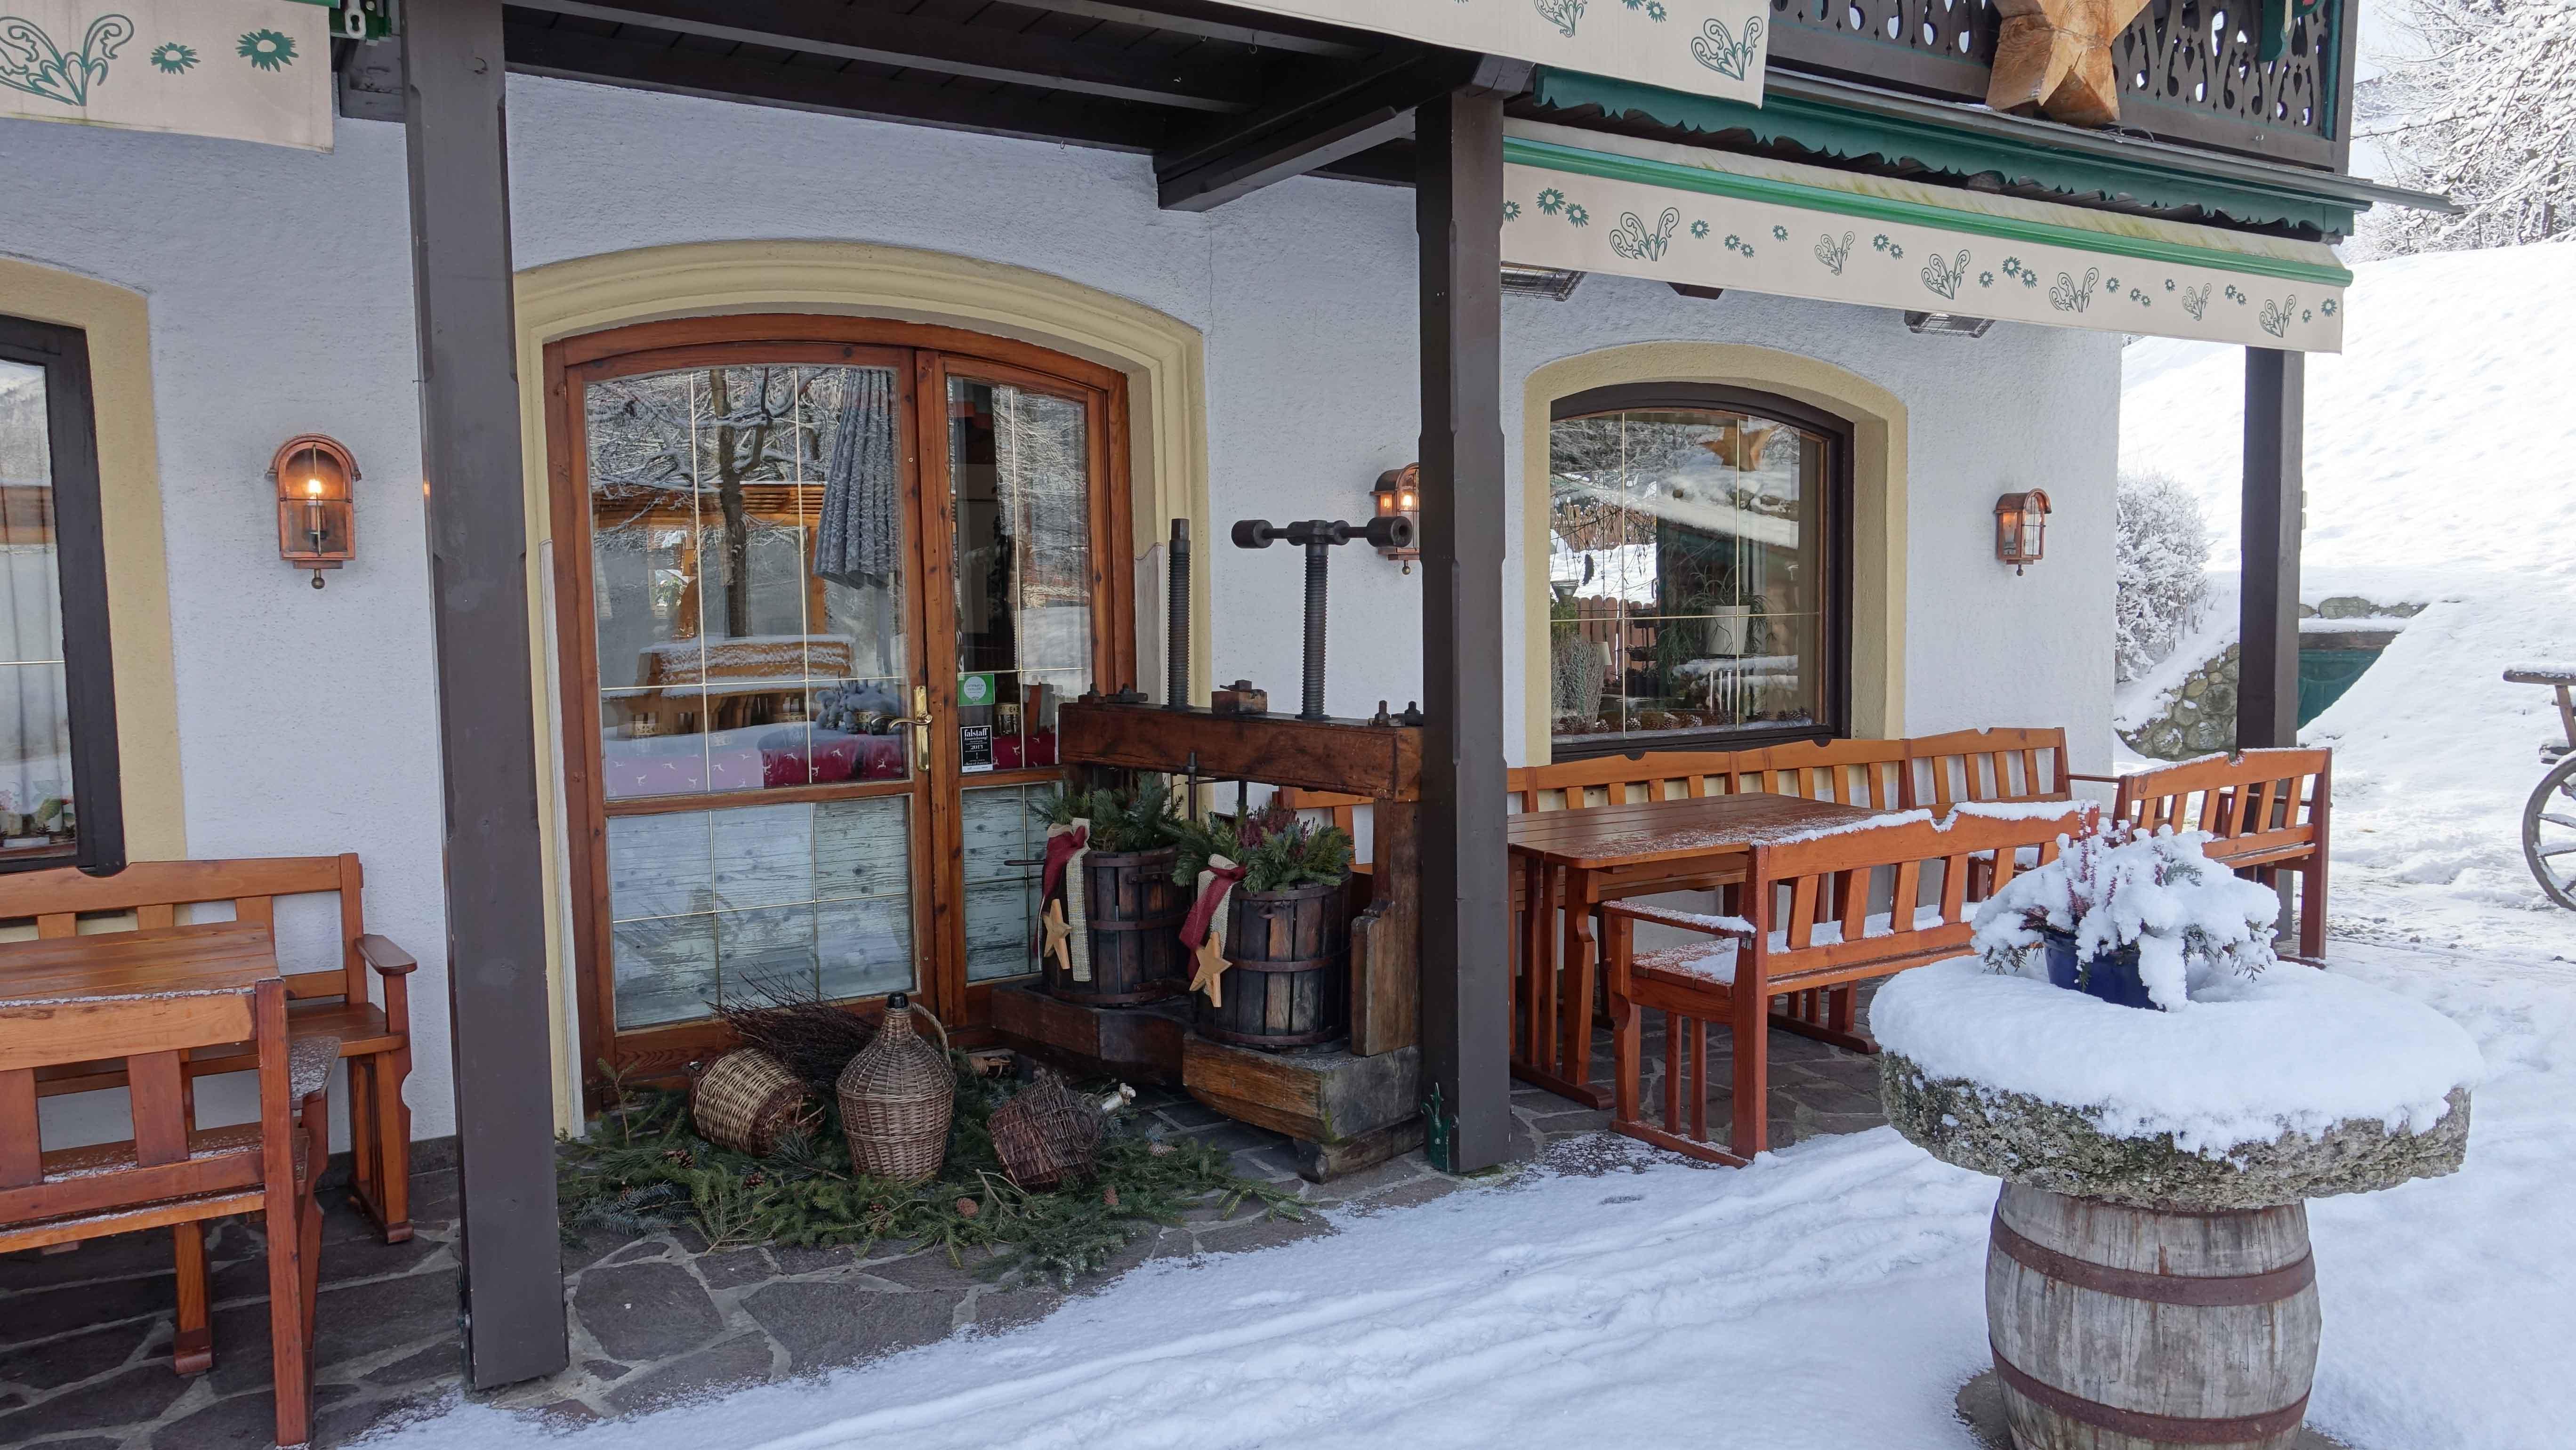 Bertahof Winter 6.JPG